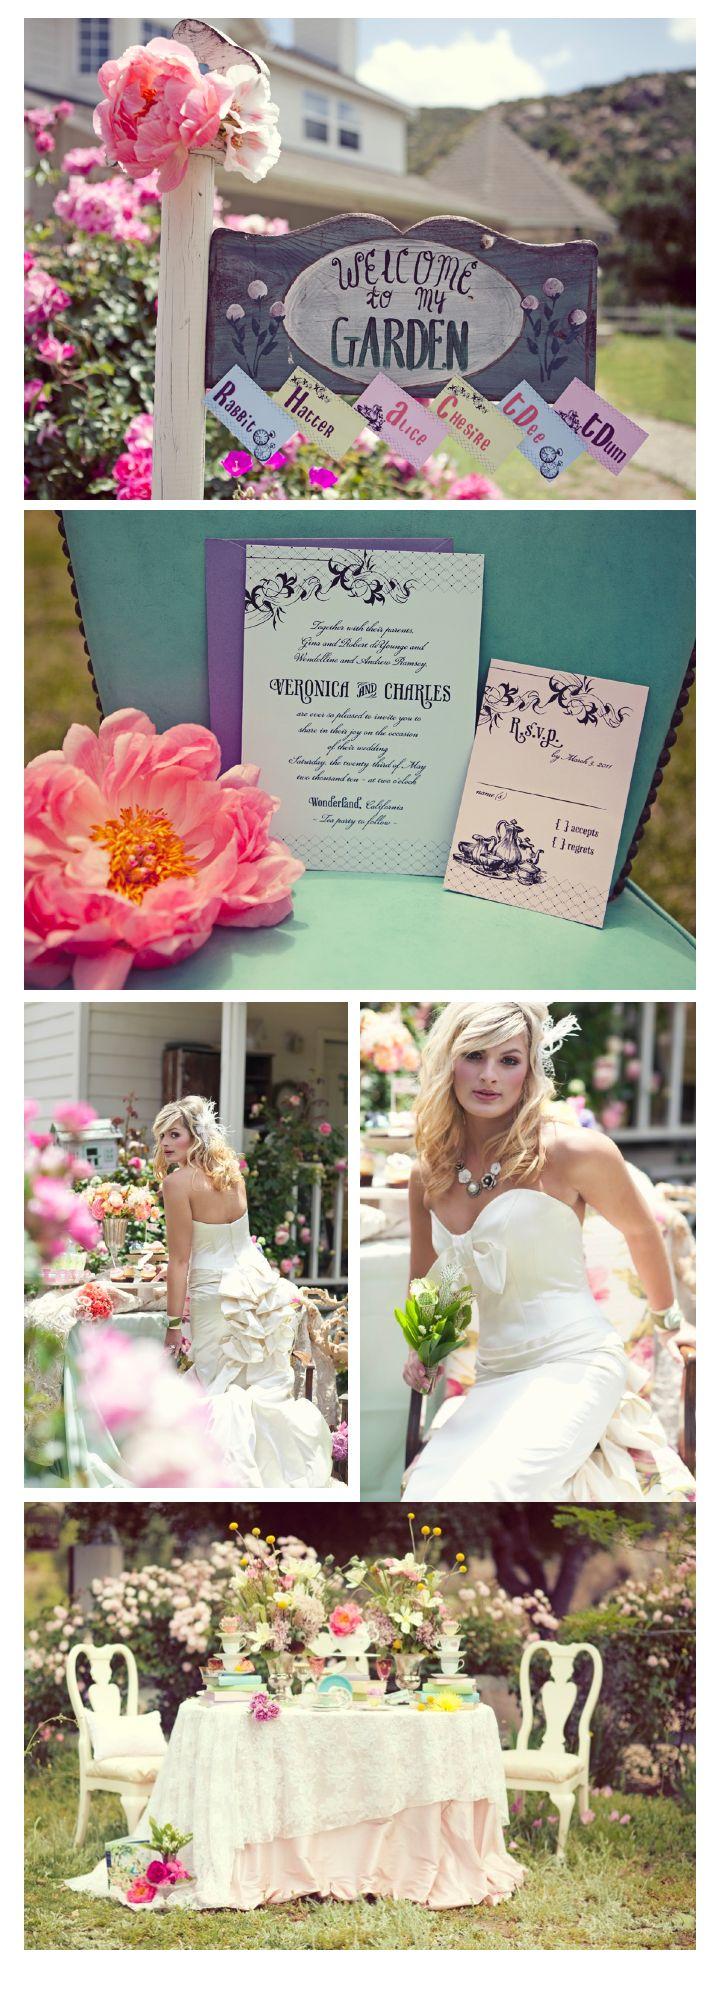 Alice in wonderland themed wedding dress   best 大人可愛いウェディング images on Pinterest  Wedding ideas